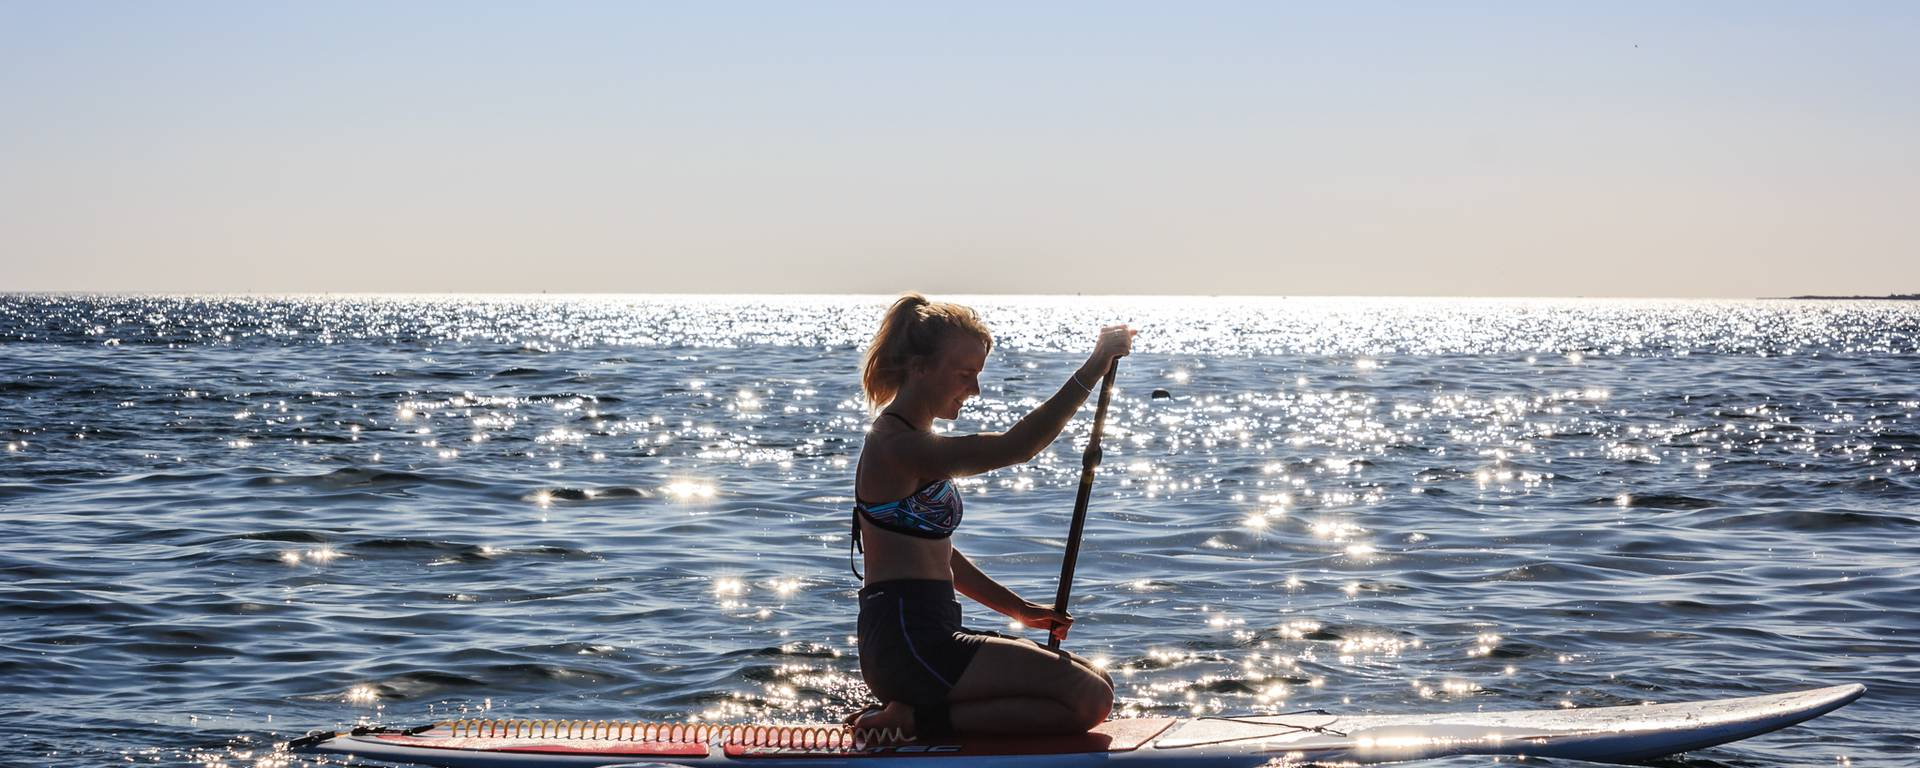 Paddle - ©L. Gloaguen